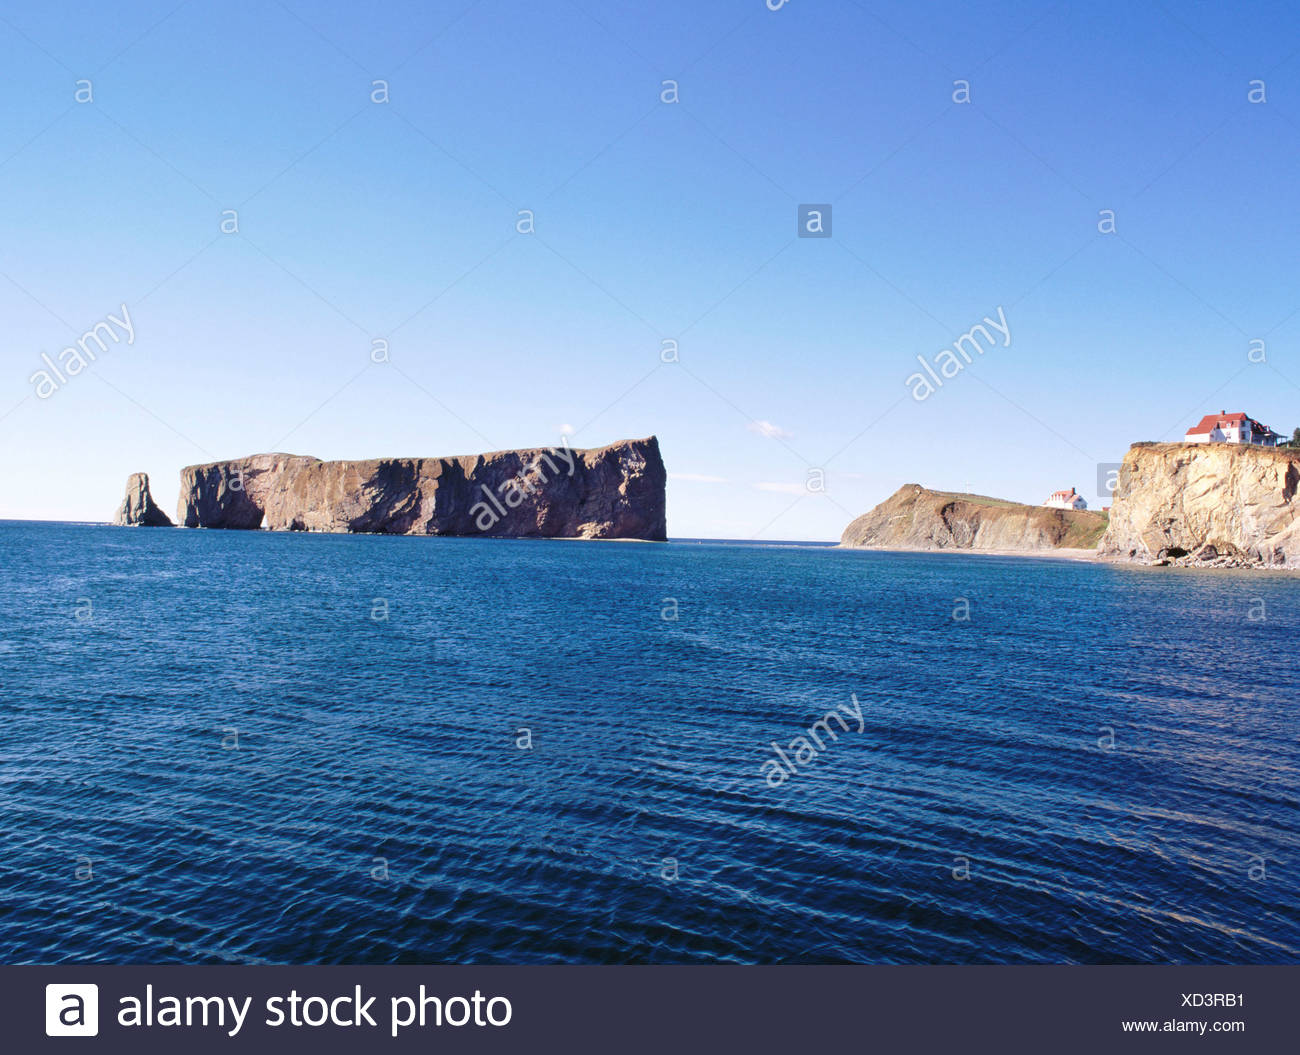 . Canada North America cliff Gasp sie peninsula houses homes cliffs